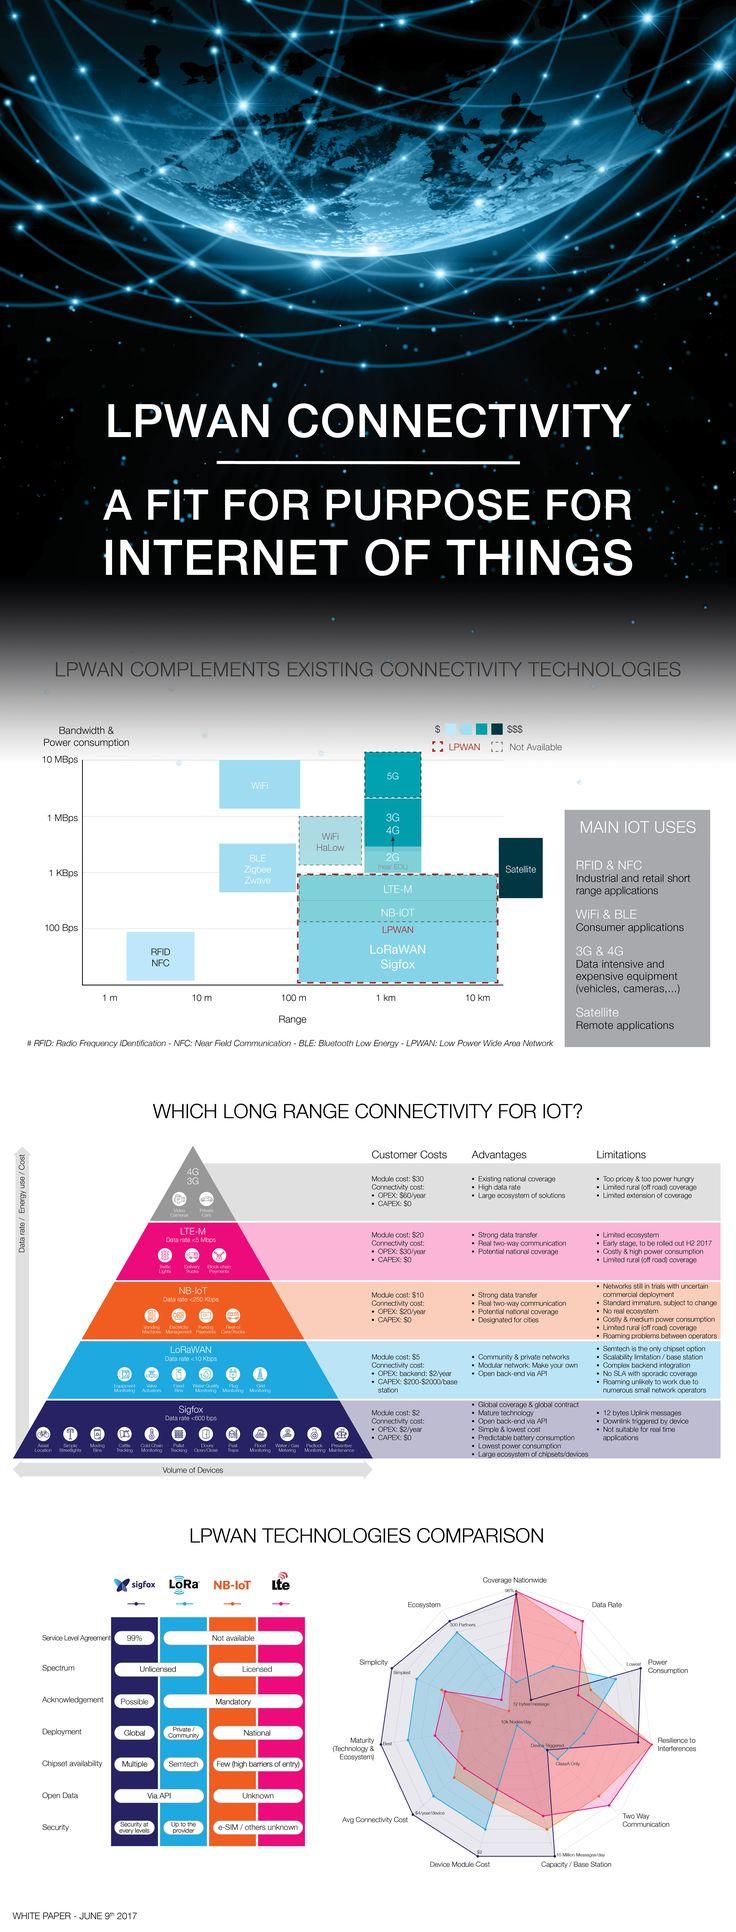 LPWAN, Sigfox, LoRawan, NB-IOT, LTE-M, Internet of Things, IoT, Connectivity, comparison